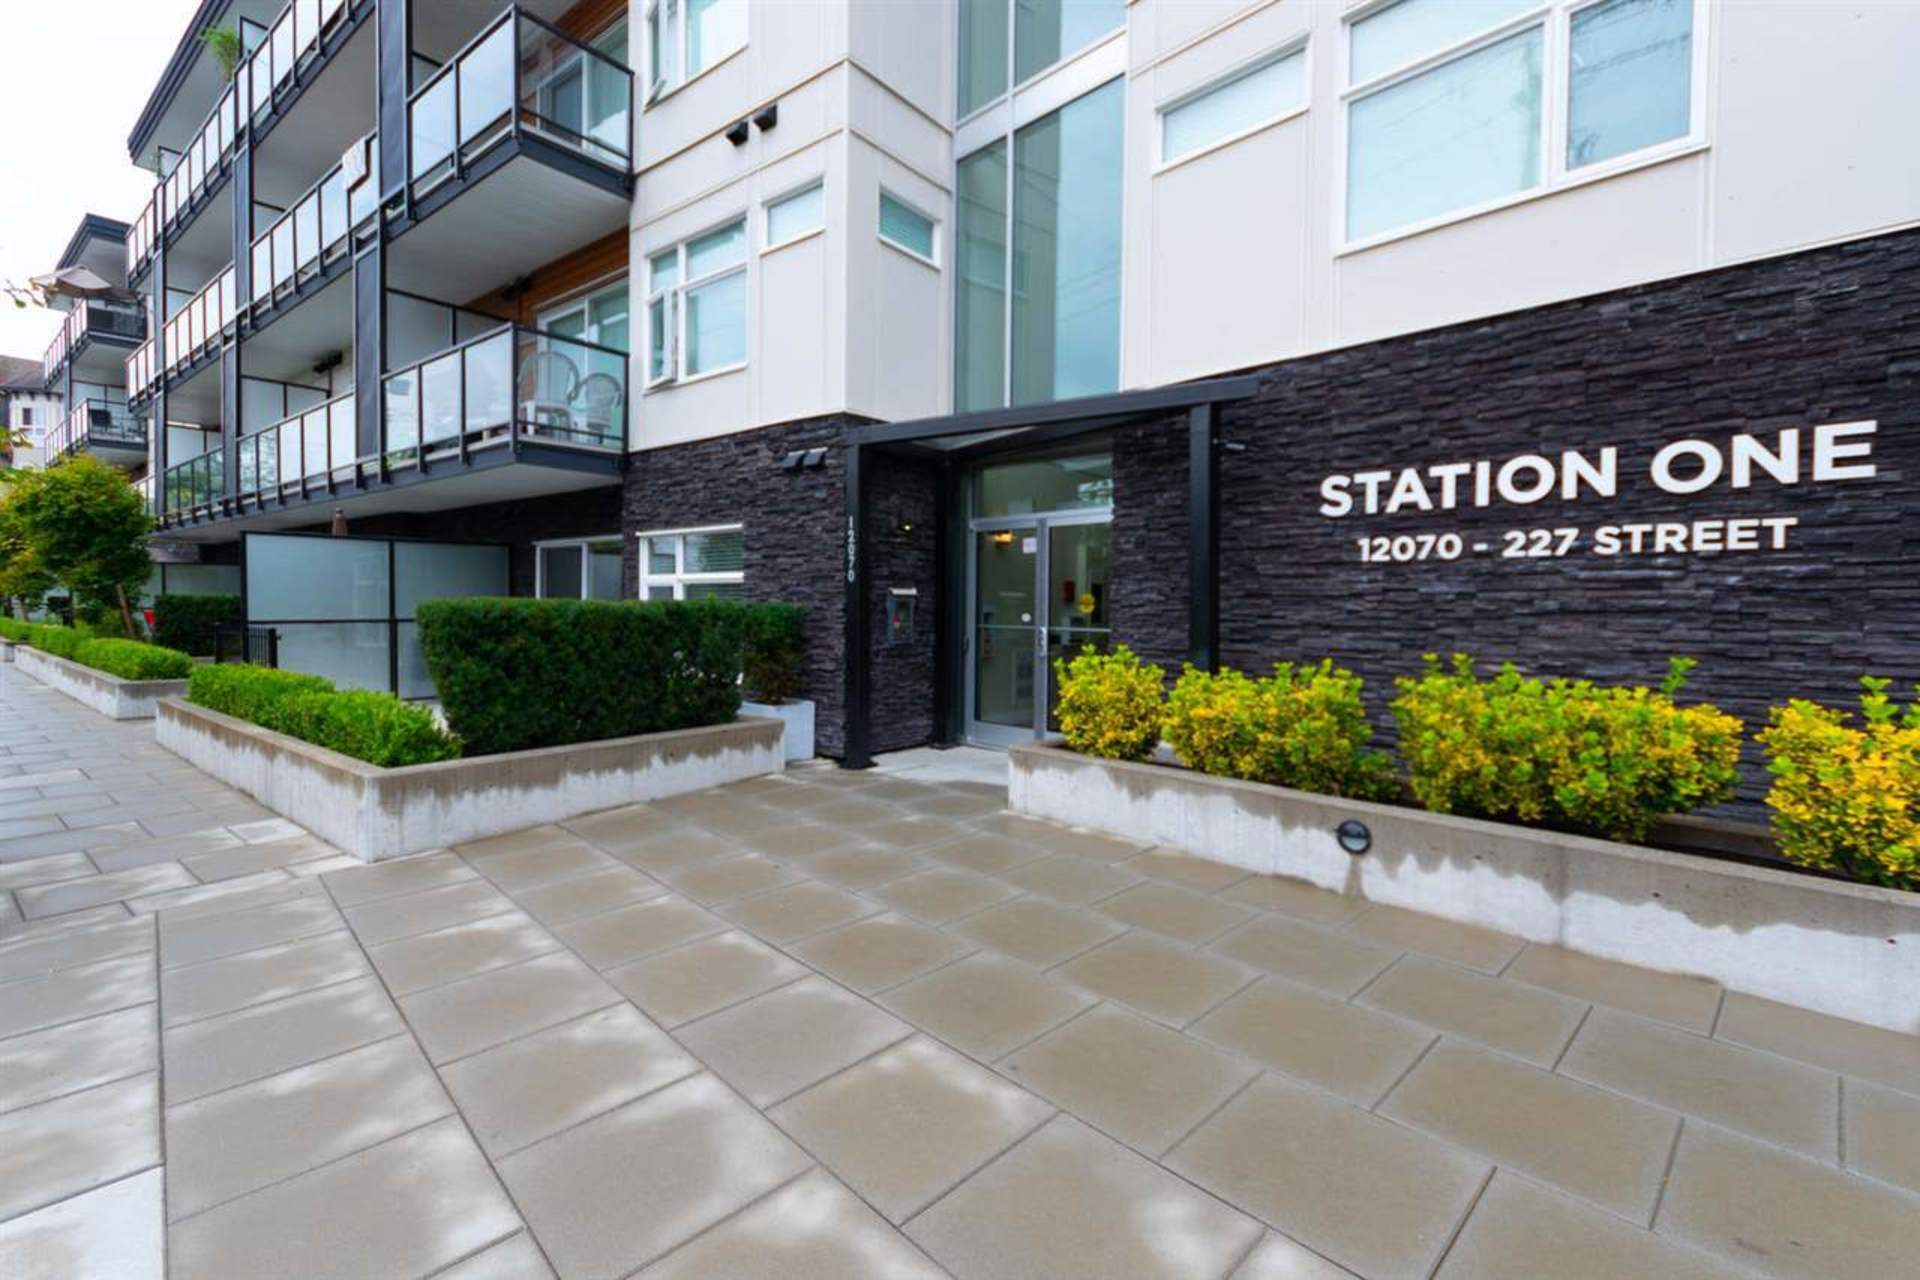 12070-227-street-east-central-maple-ridge-01 at 106 - 12070 227 Street, East Central, Maple Ridge